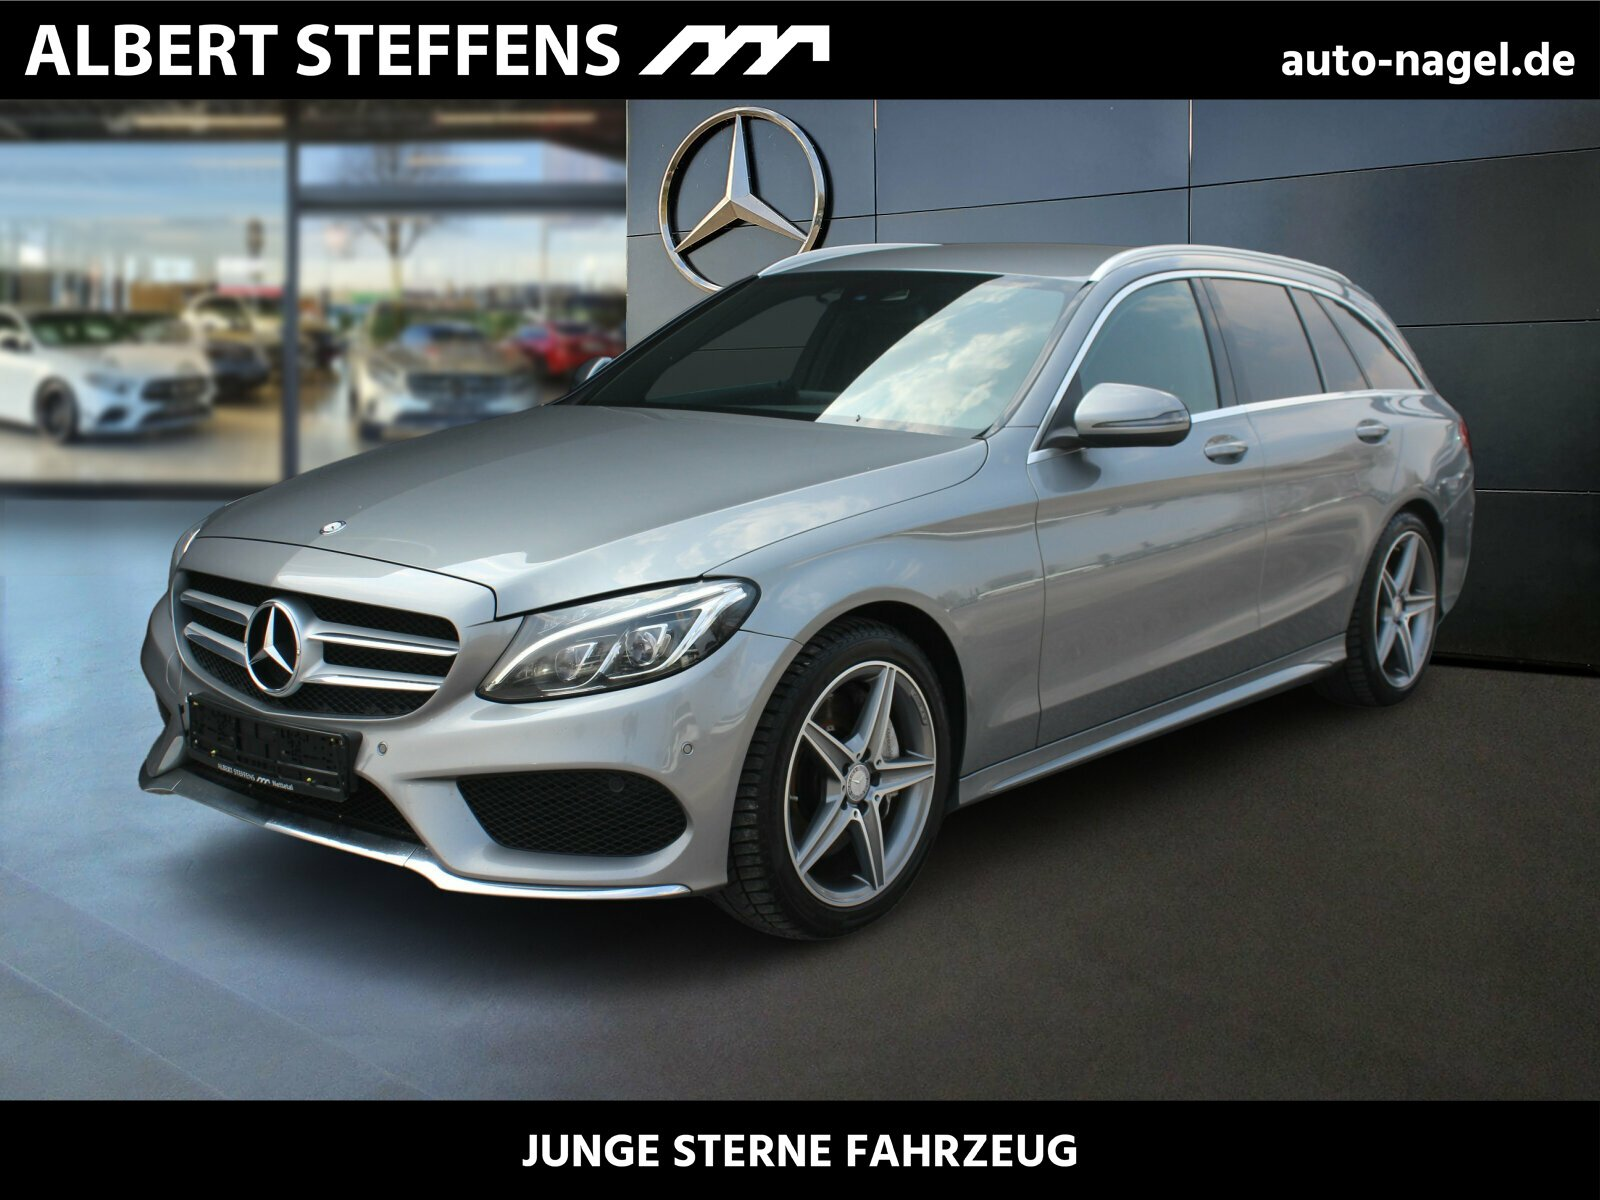 Mercedes-Benz C 250 T AMG NAVI+LED+Sitzh+Kamera+DAB+Ambiente, Jahr 2016, Benzin